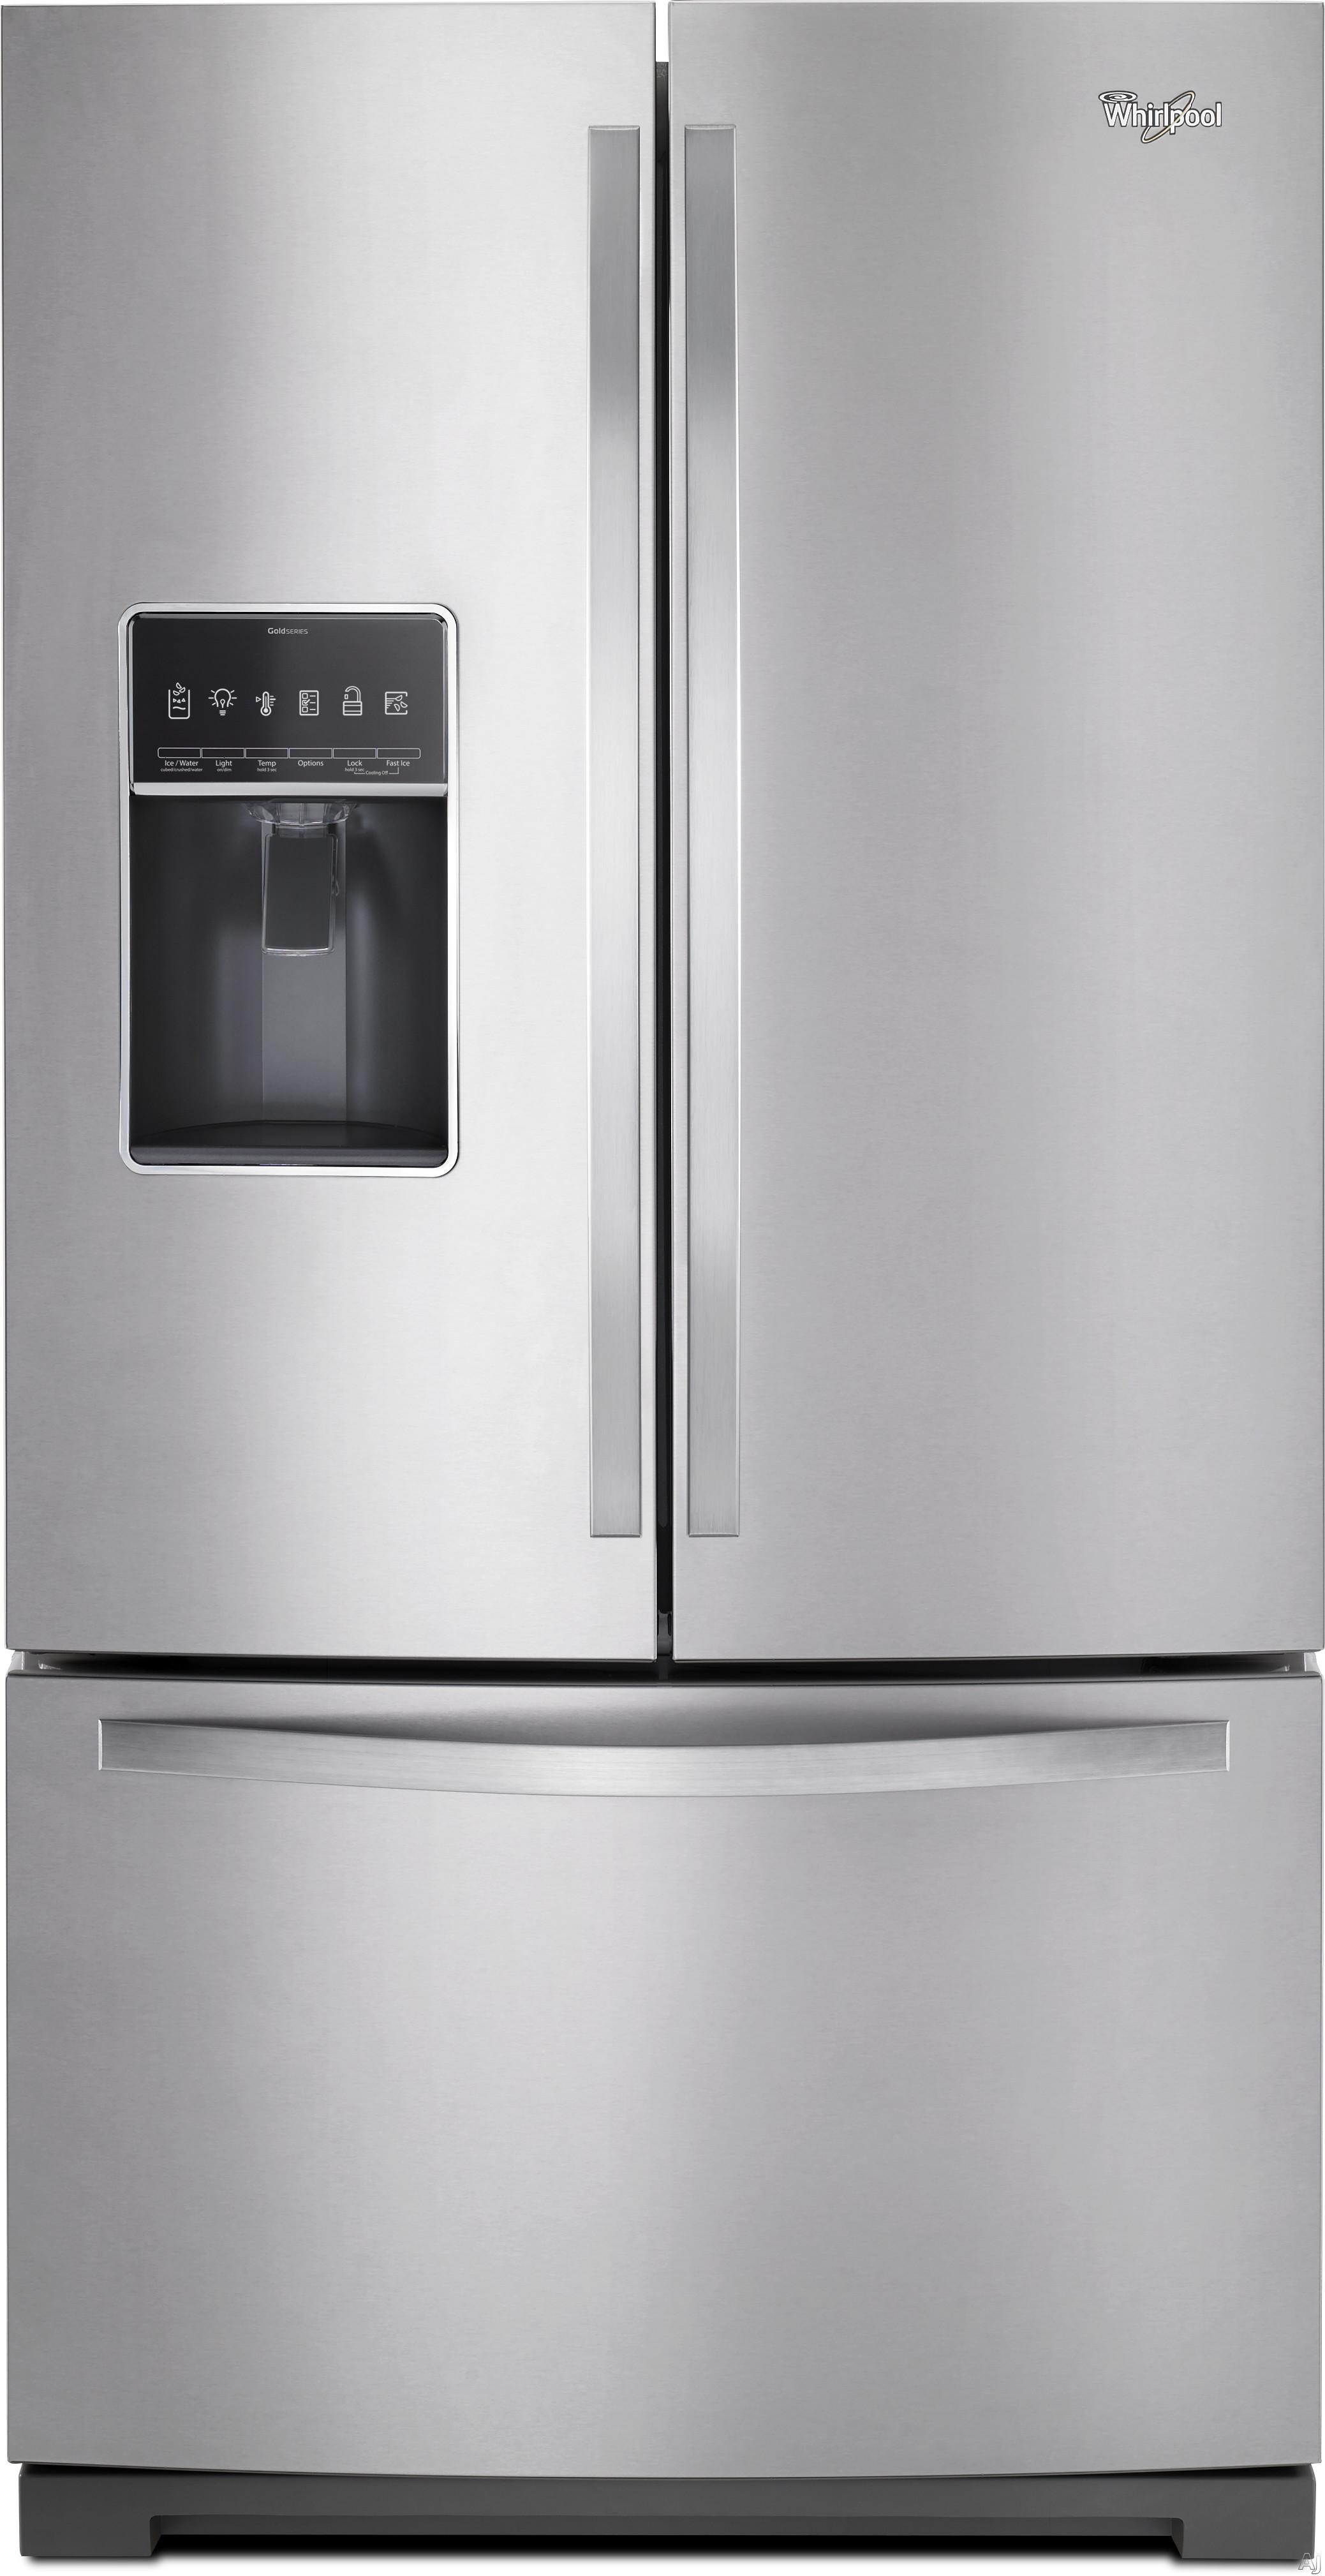 Whirlpool Wrf757sdem 26 8 Cu Ft French Door Refrigerator